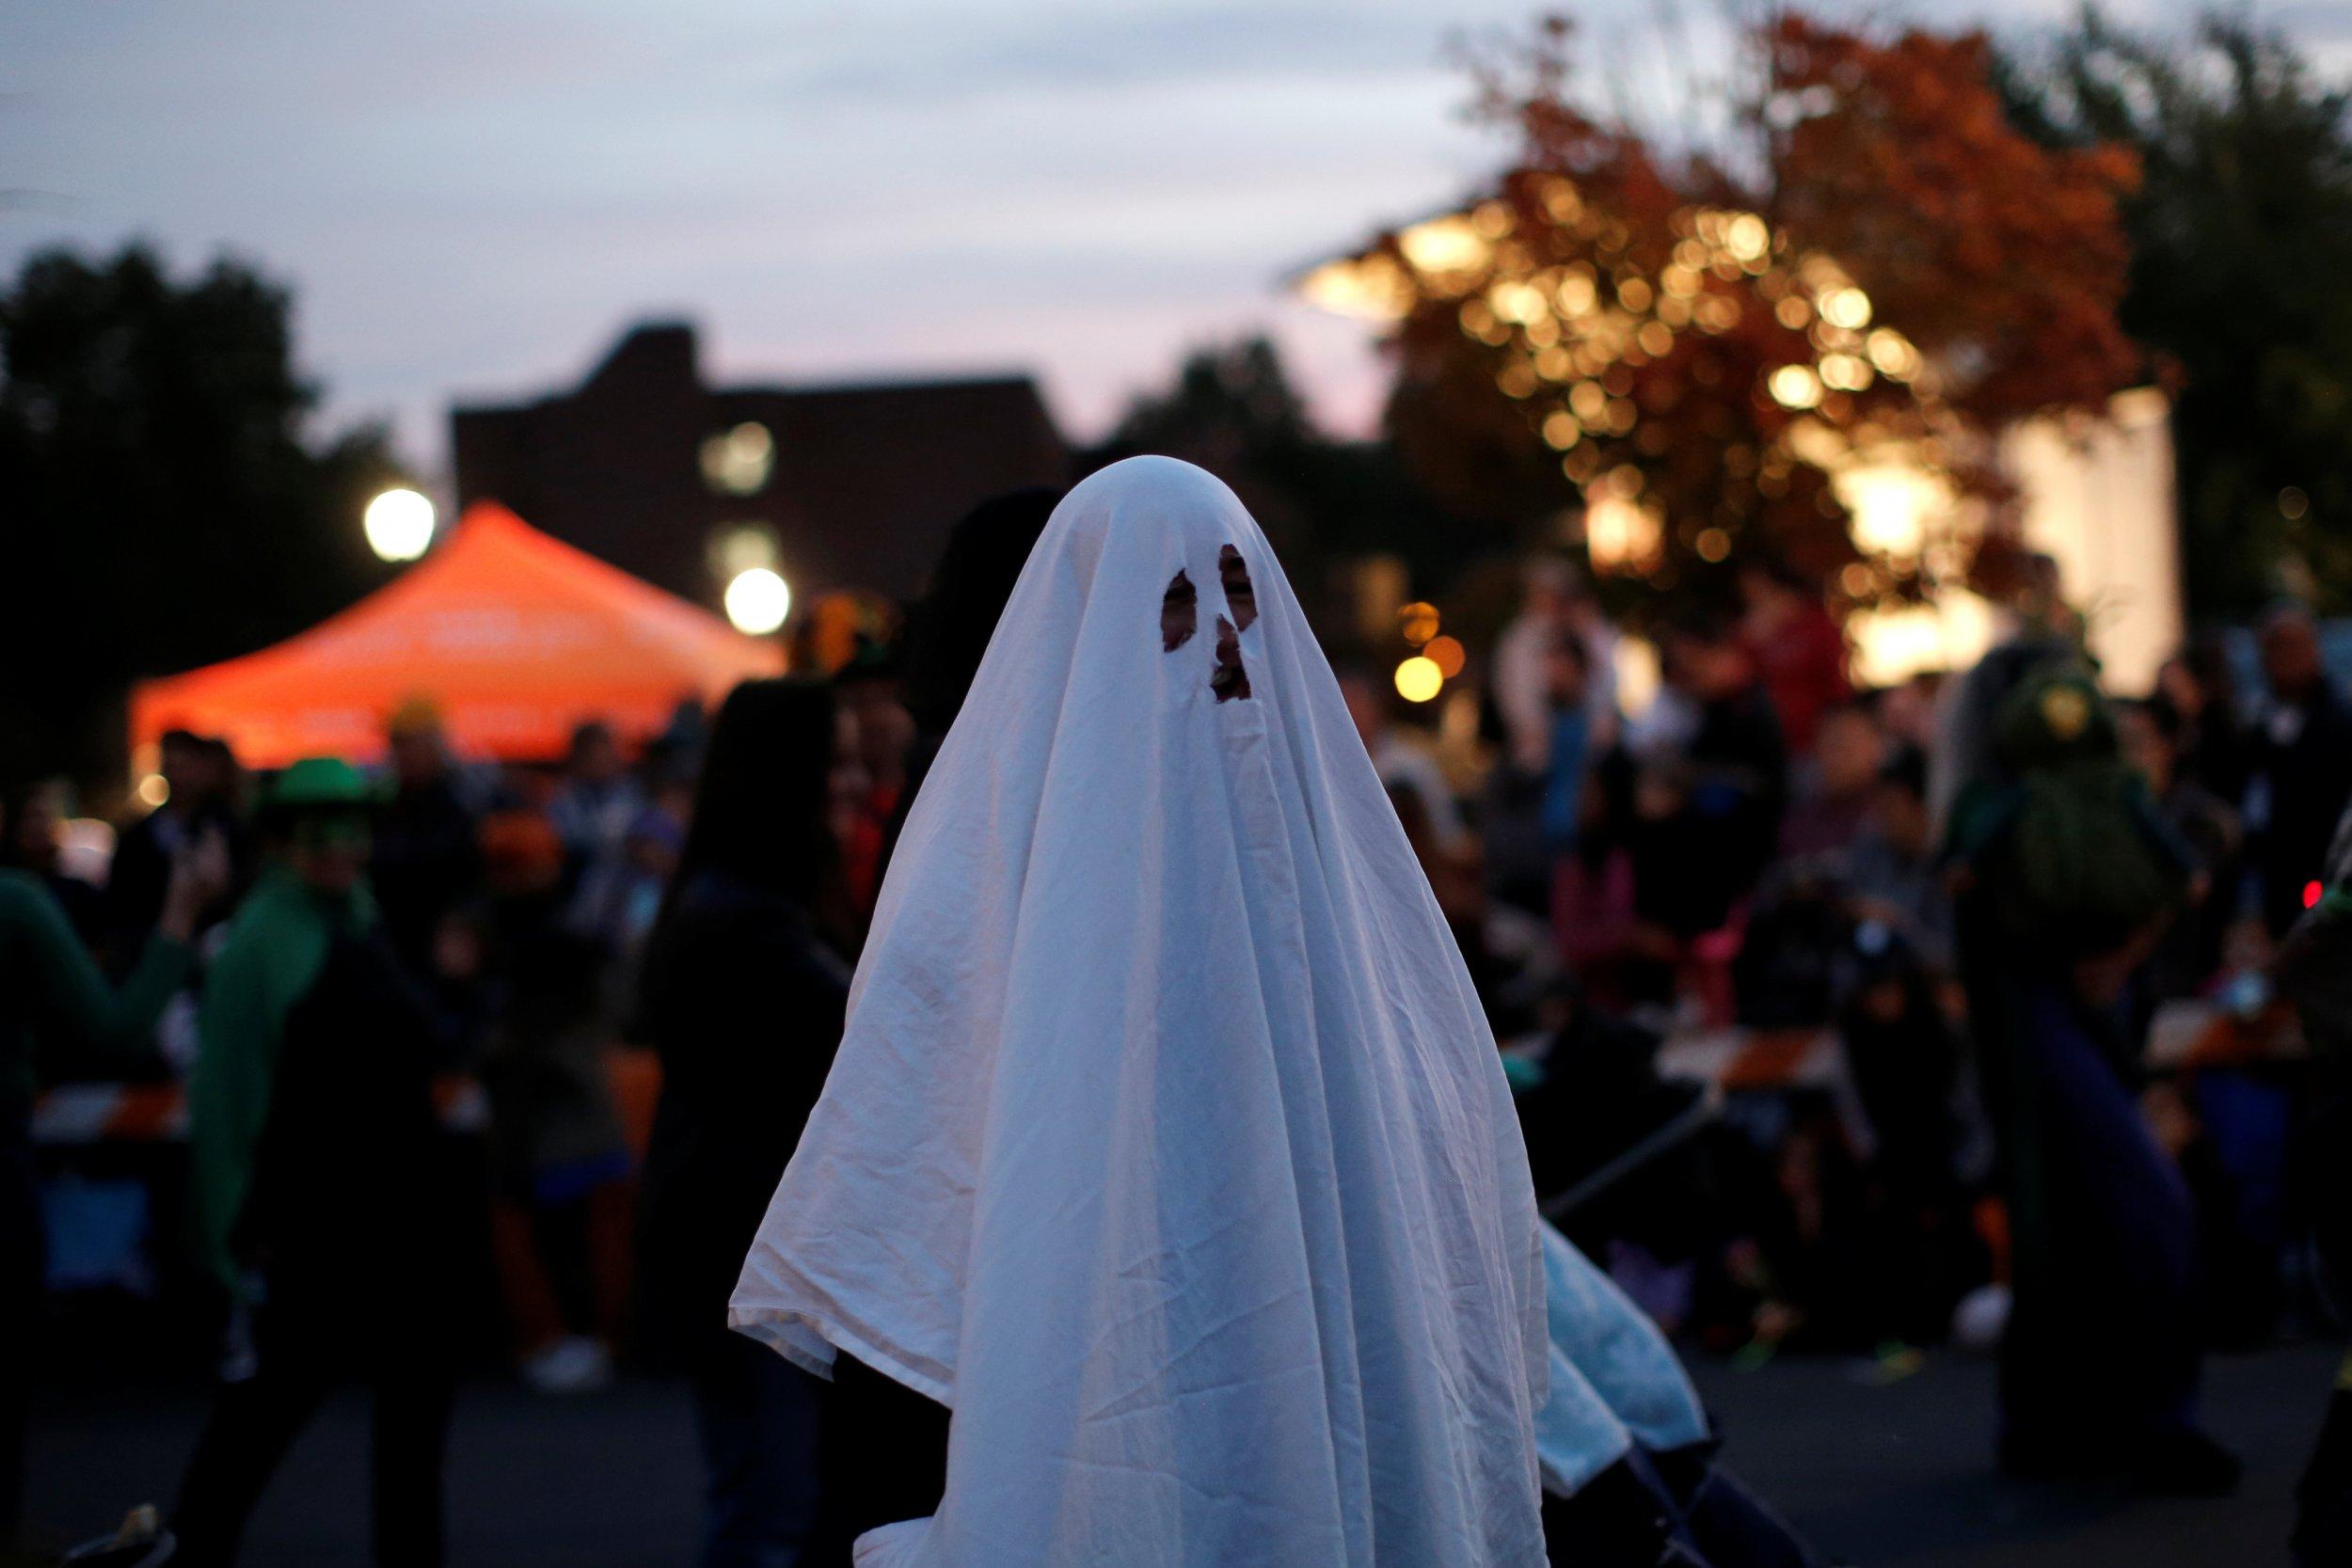 10_20_ghost_Halloween